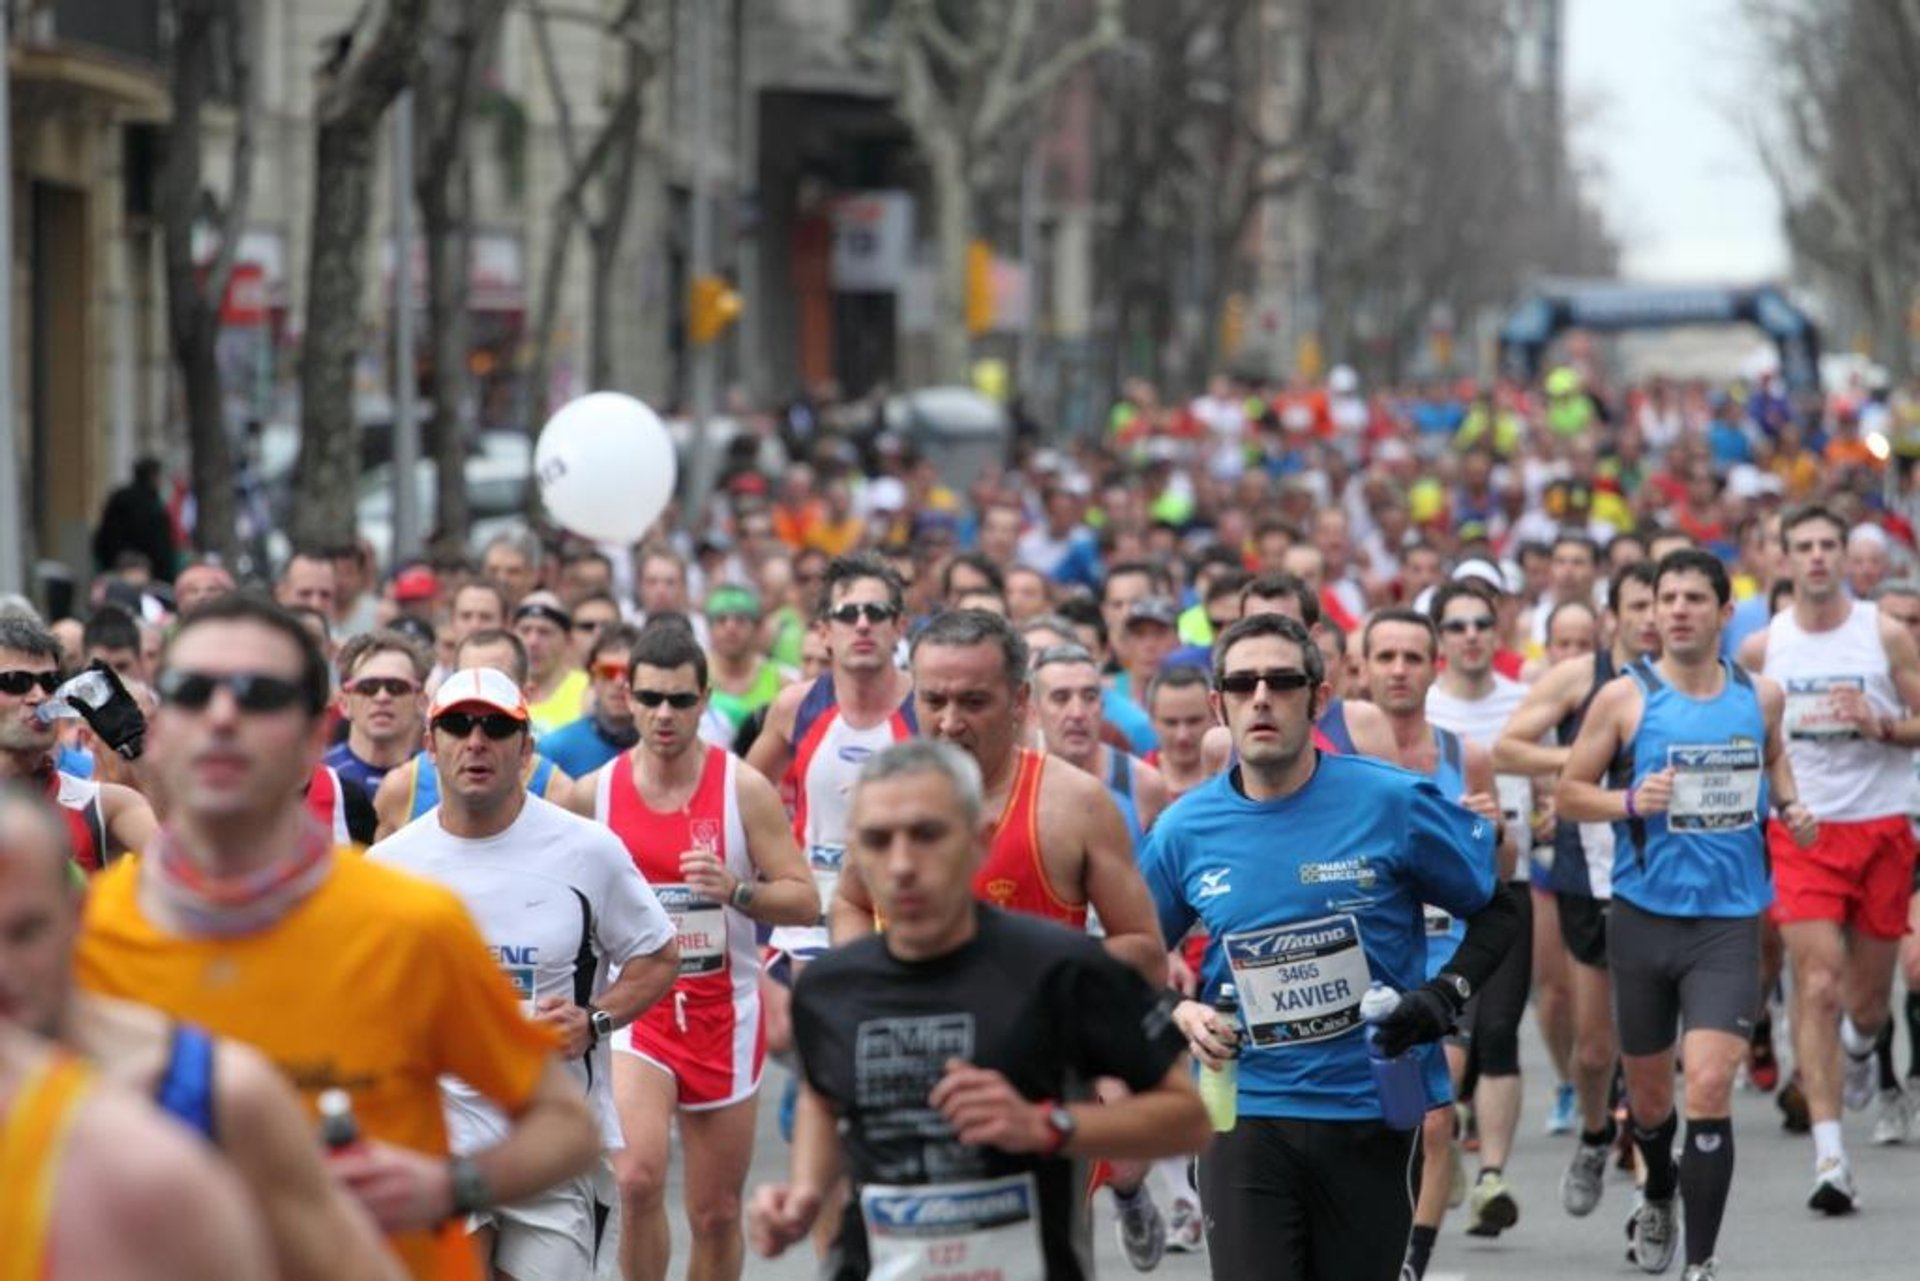 Barcelona Marathon in Barcelona 2020 - Best Time